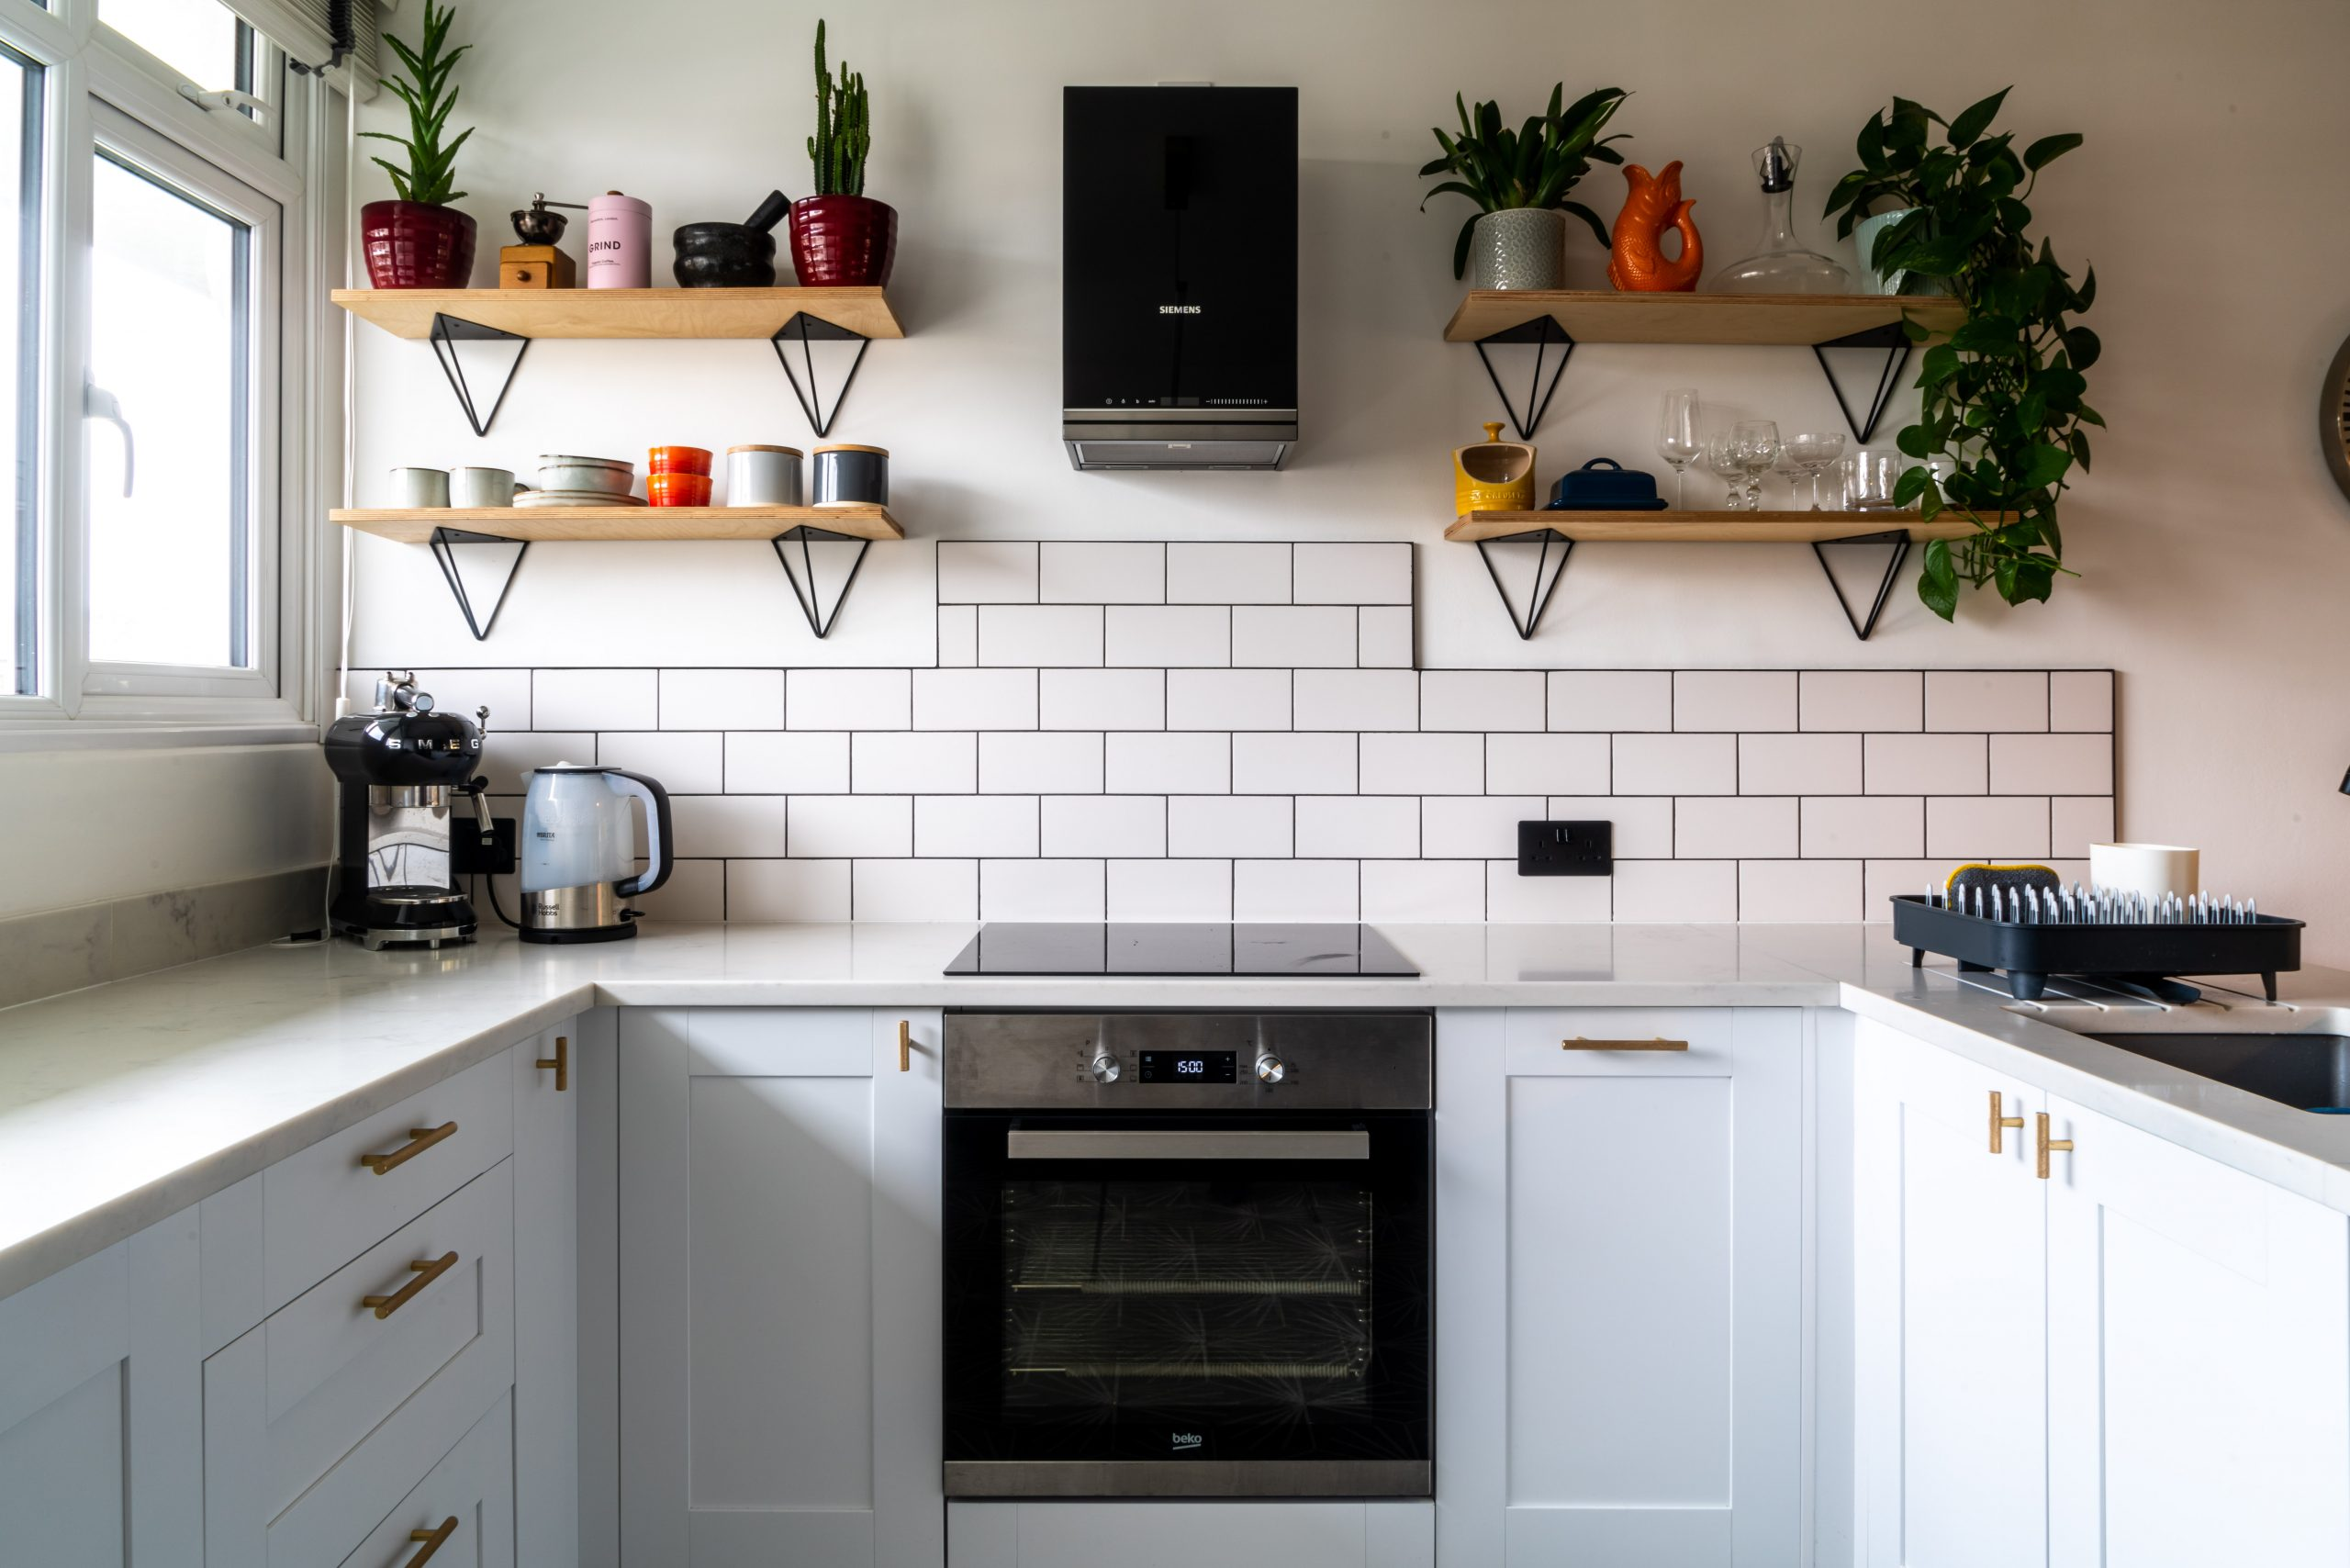 Planning a London Kitchen Renovation